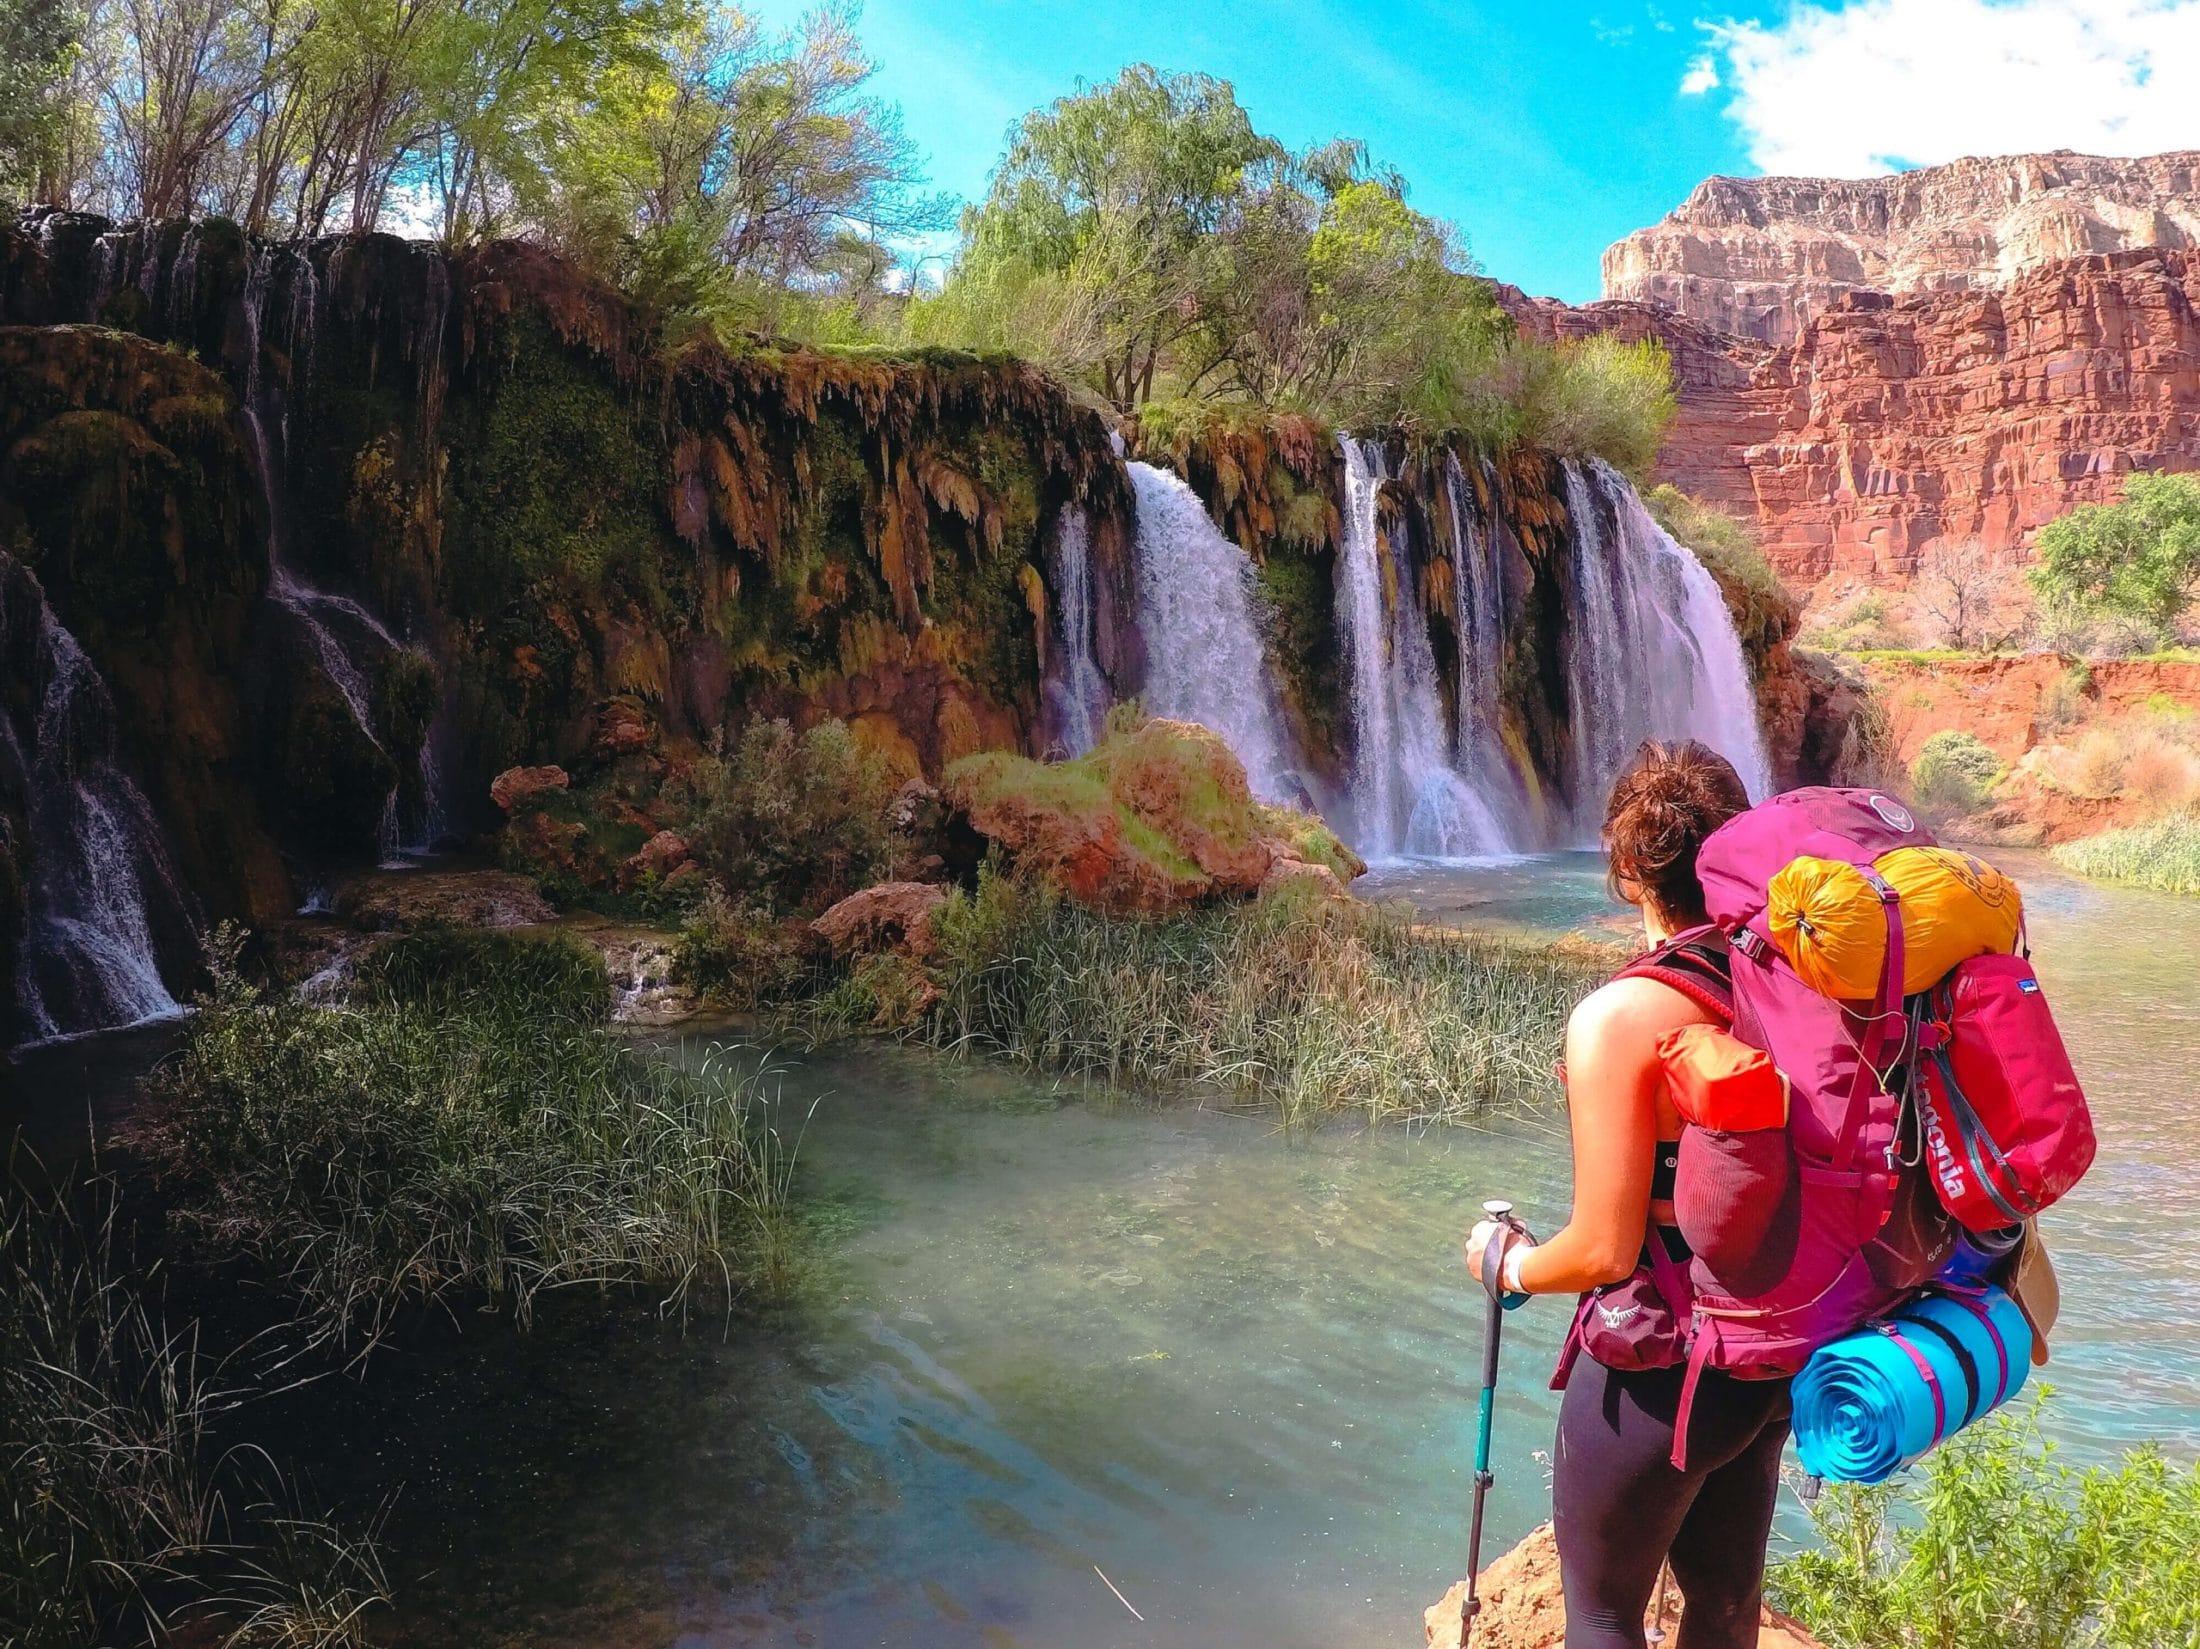 Navajo and Little Rock Falls at Havasupai